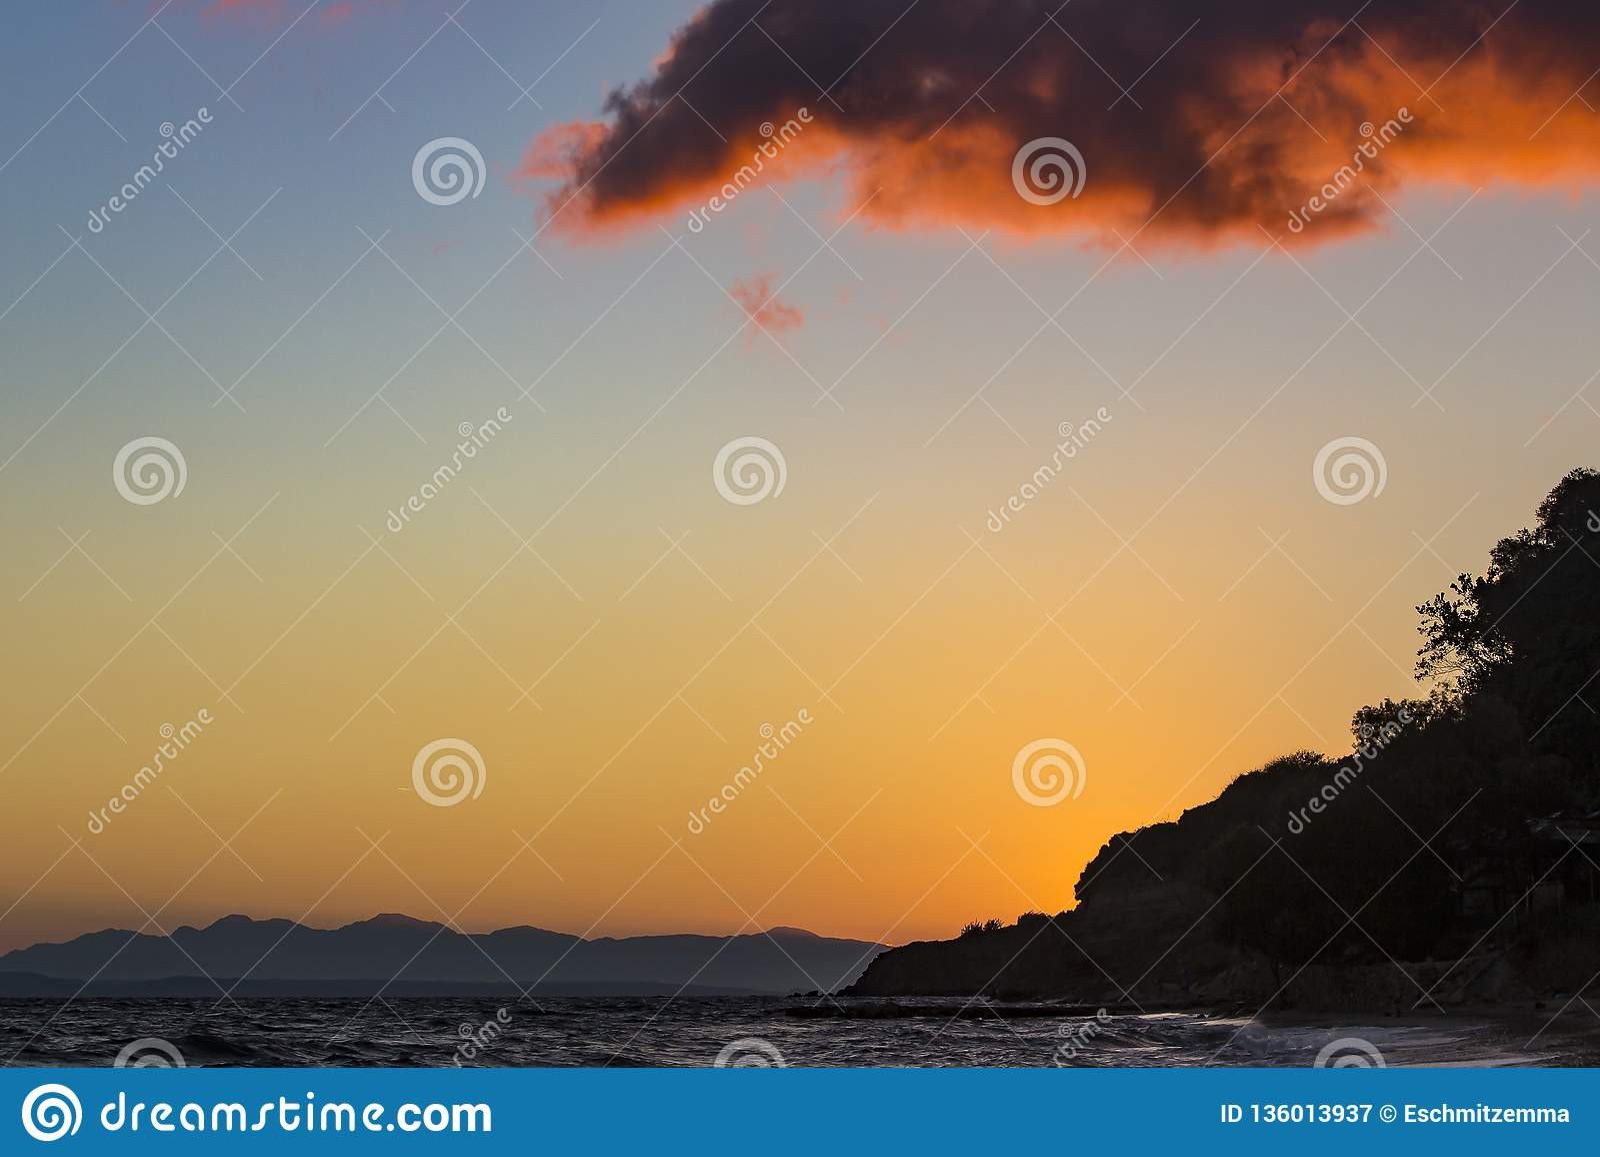 Sunrise with beautifully coloured sky and clouds near Tsilivi, Zakynthos, Greece